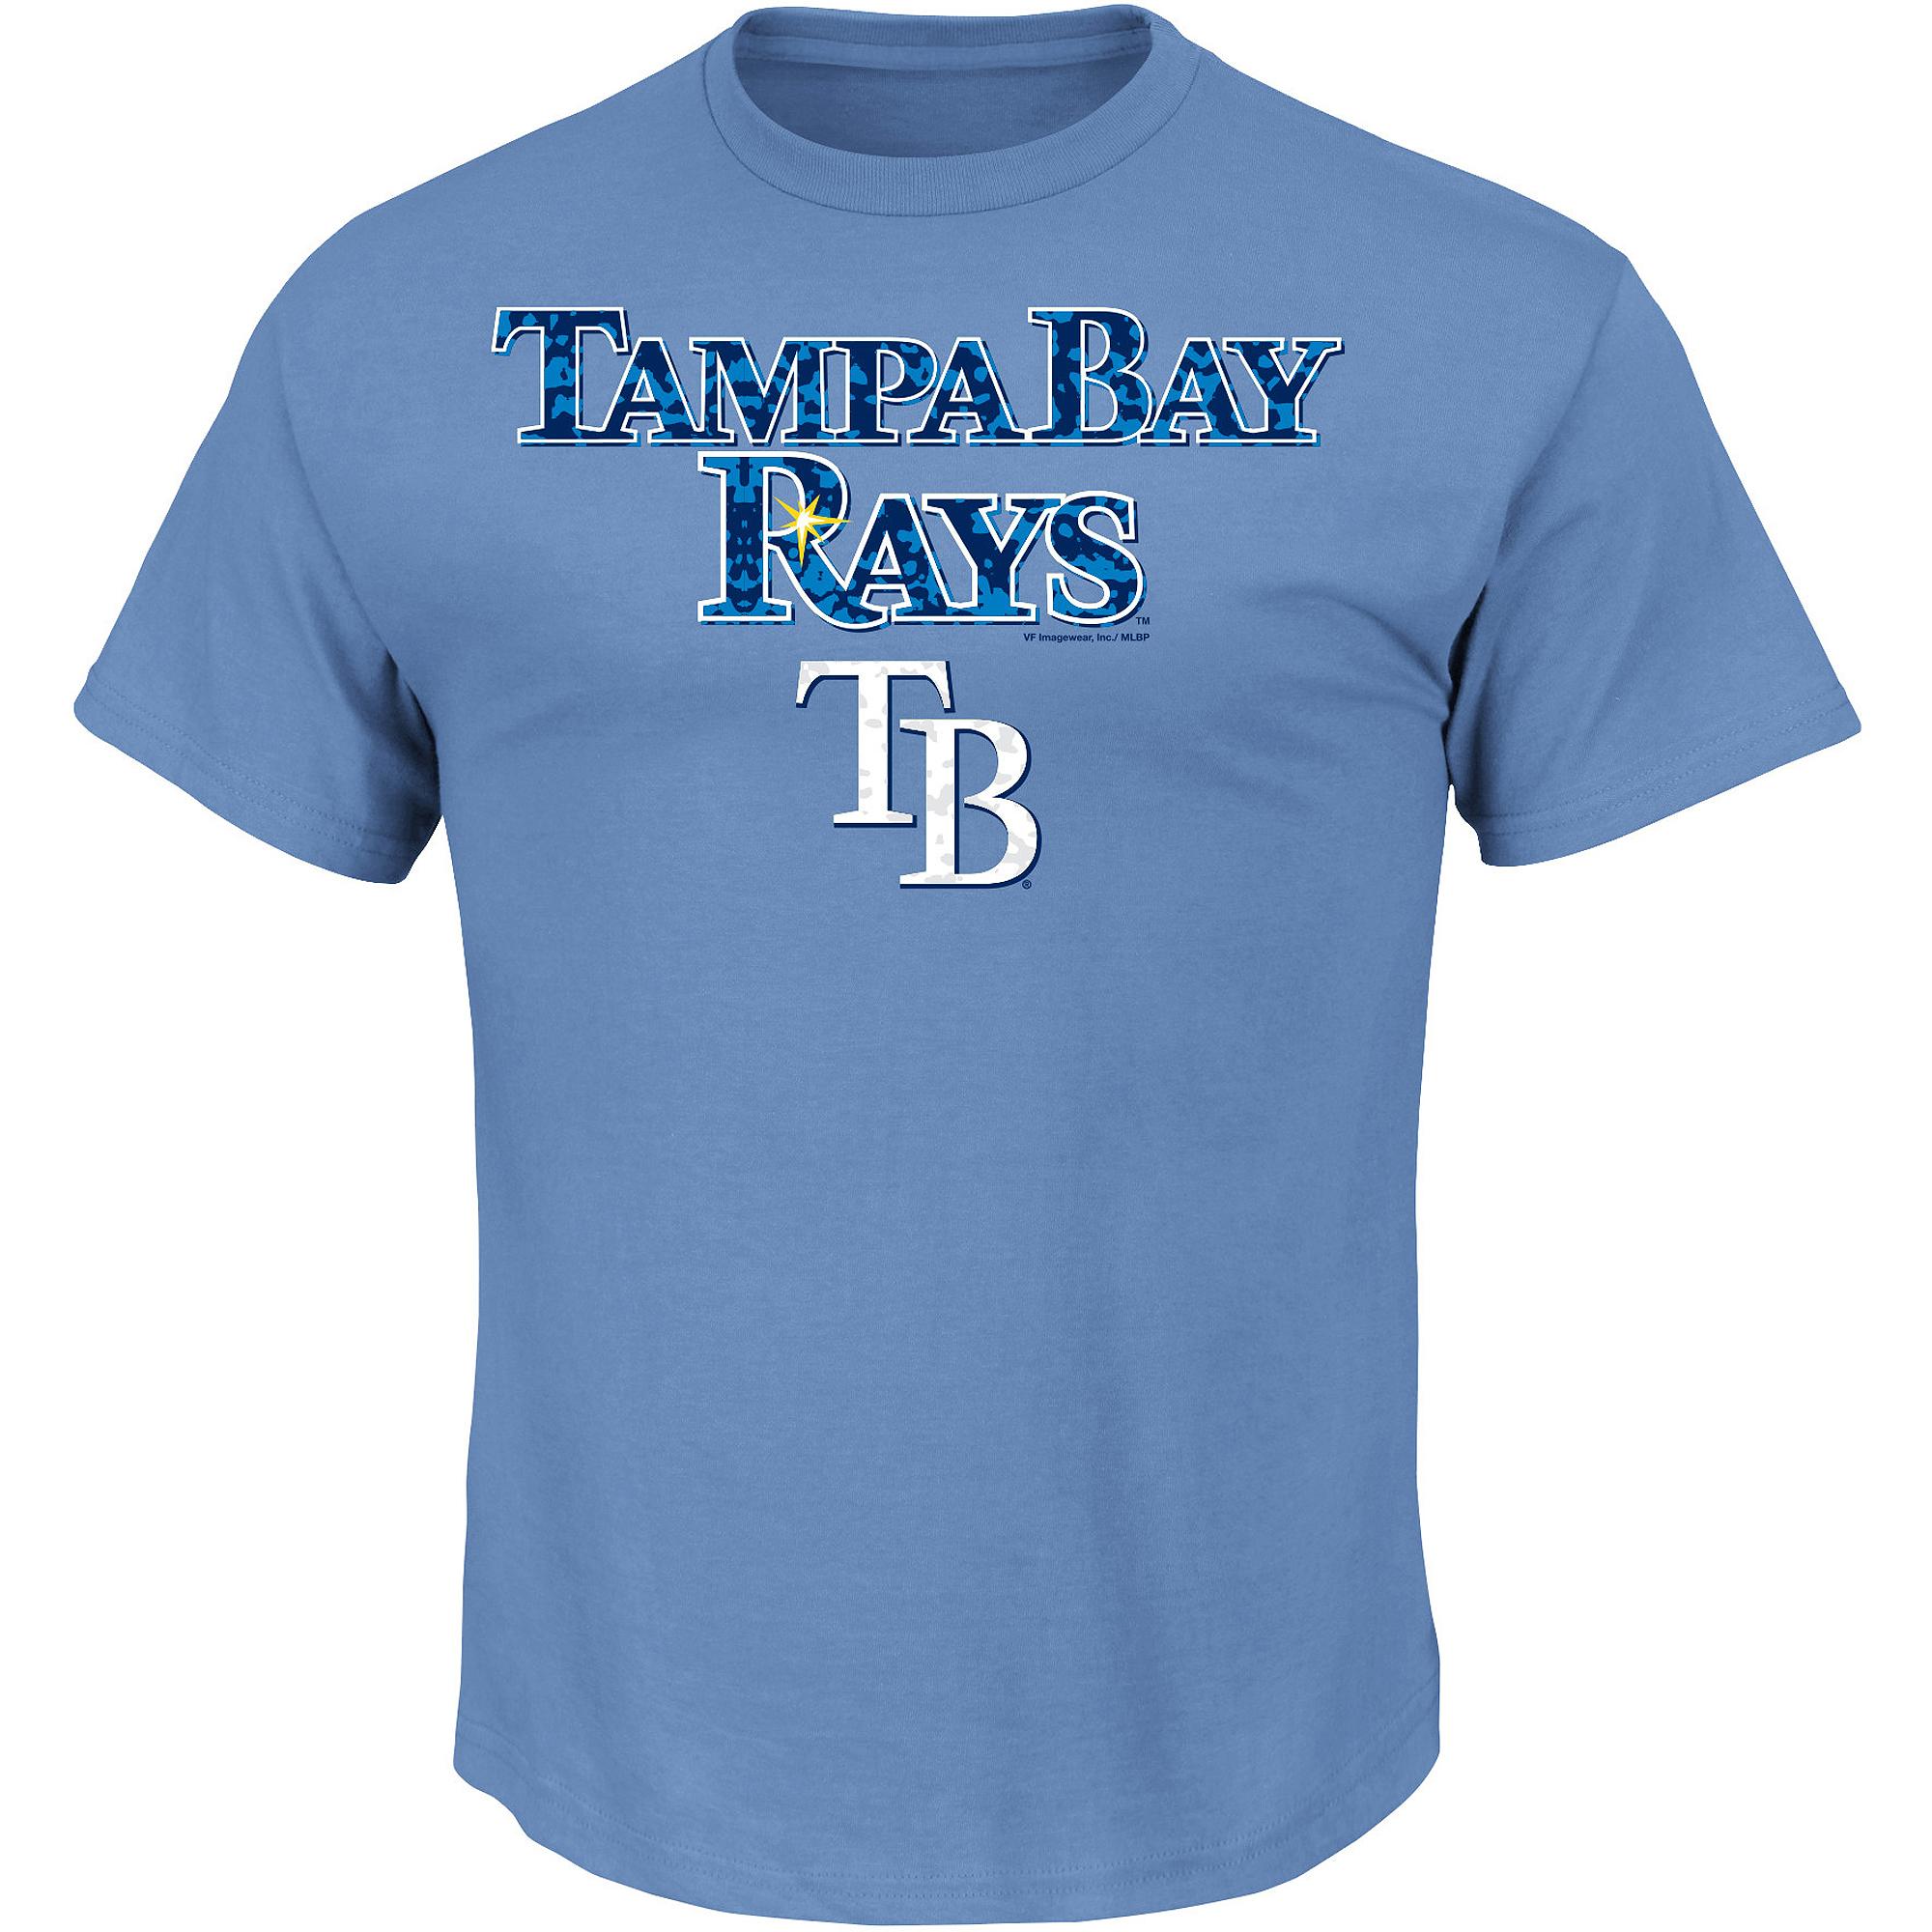 Men's MLB Tampa Bay Rays Team Tee